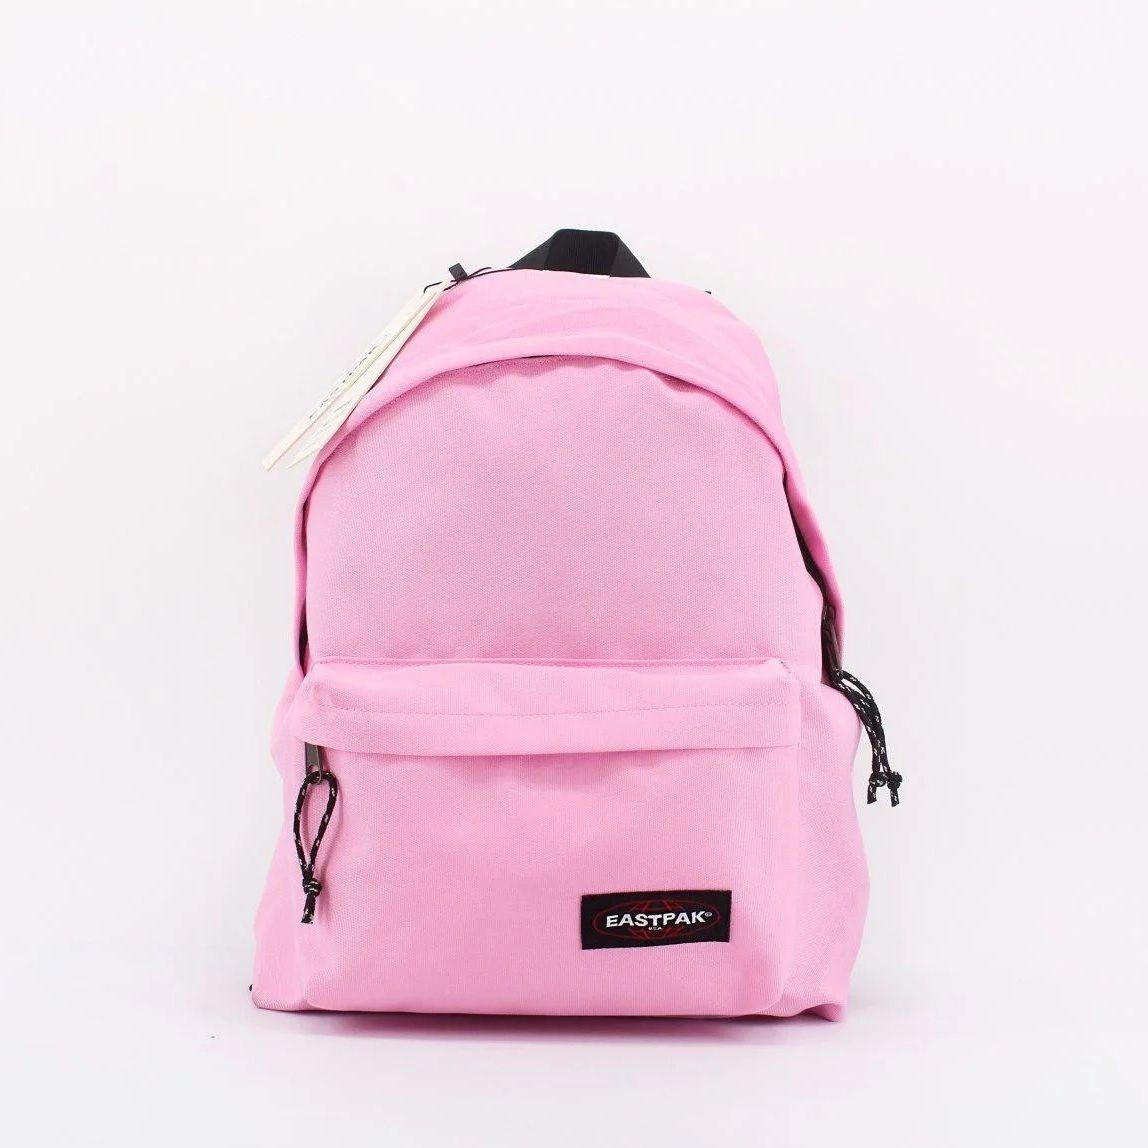 Повседневный рюкзак в стиле Eastpak (24 литра)